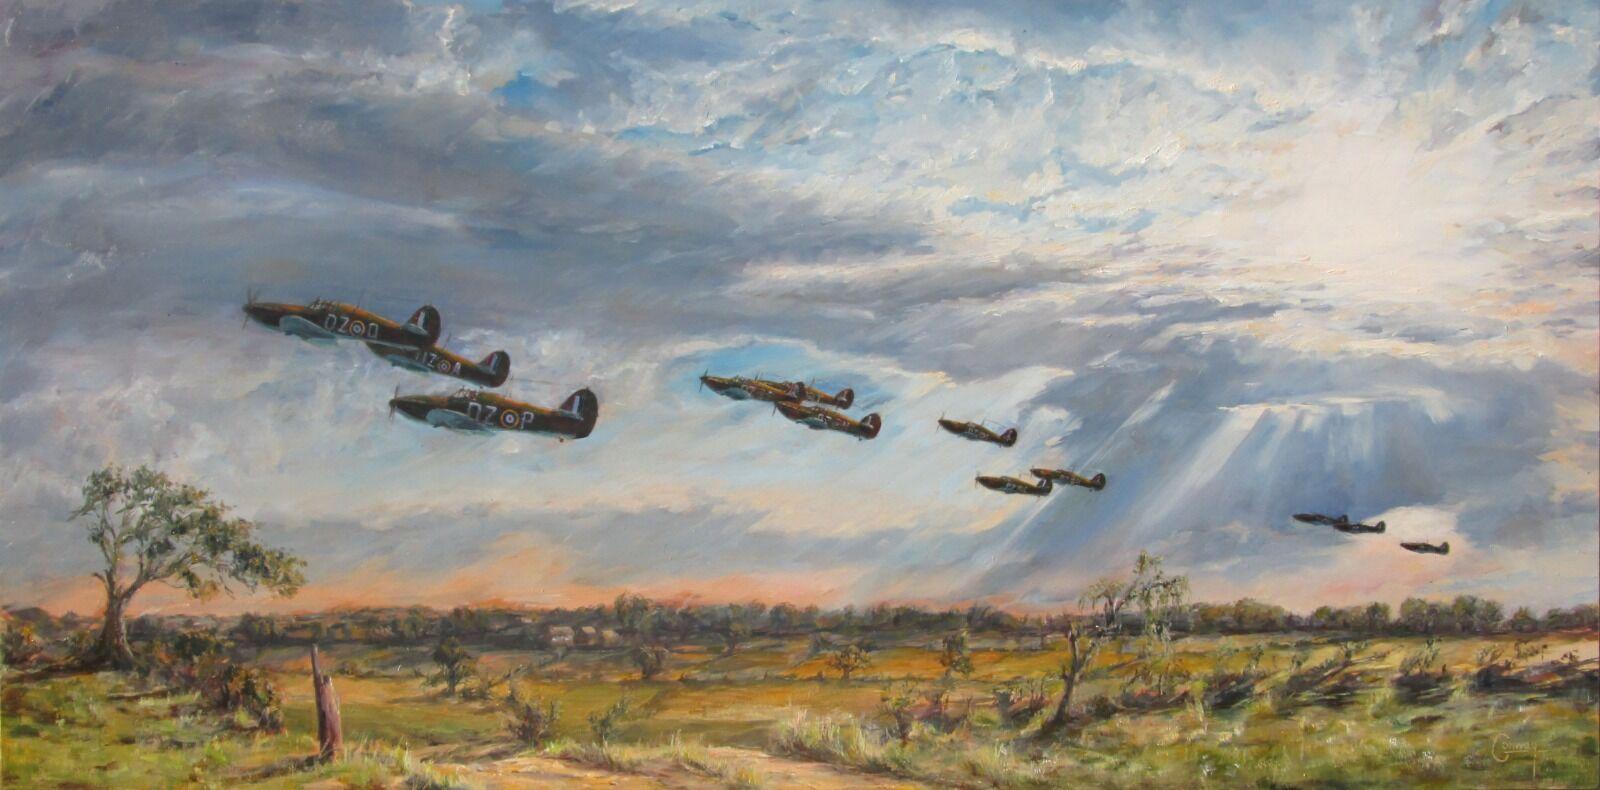 'Climbing to Defend' - Hurricanes of No. 151 Squadron